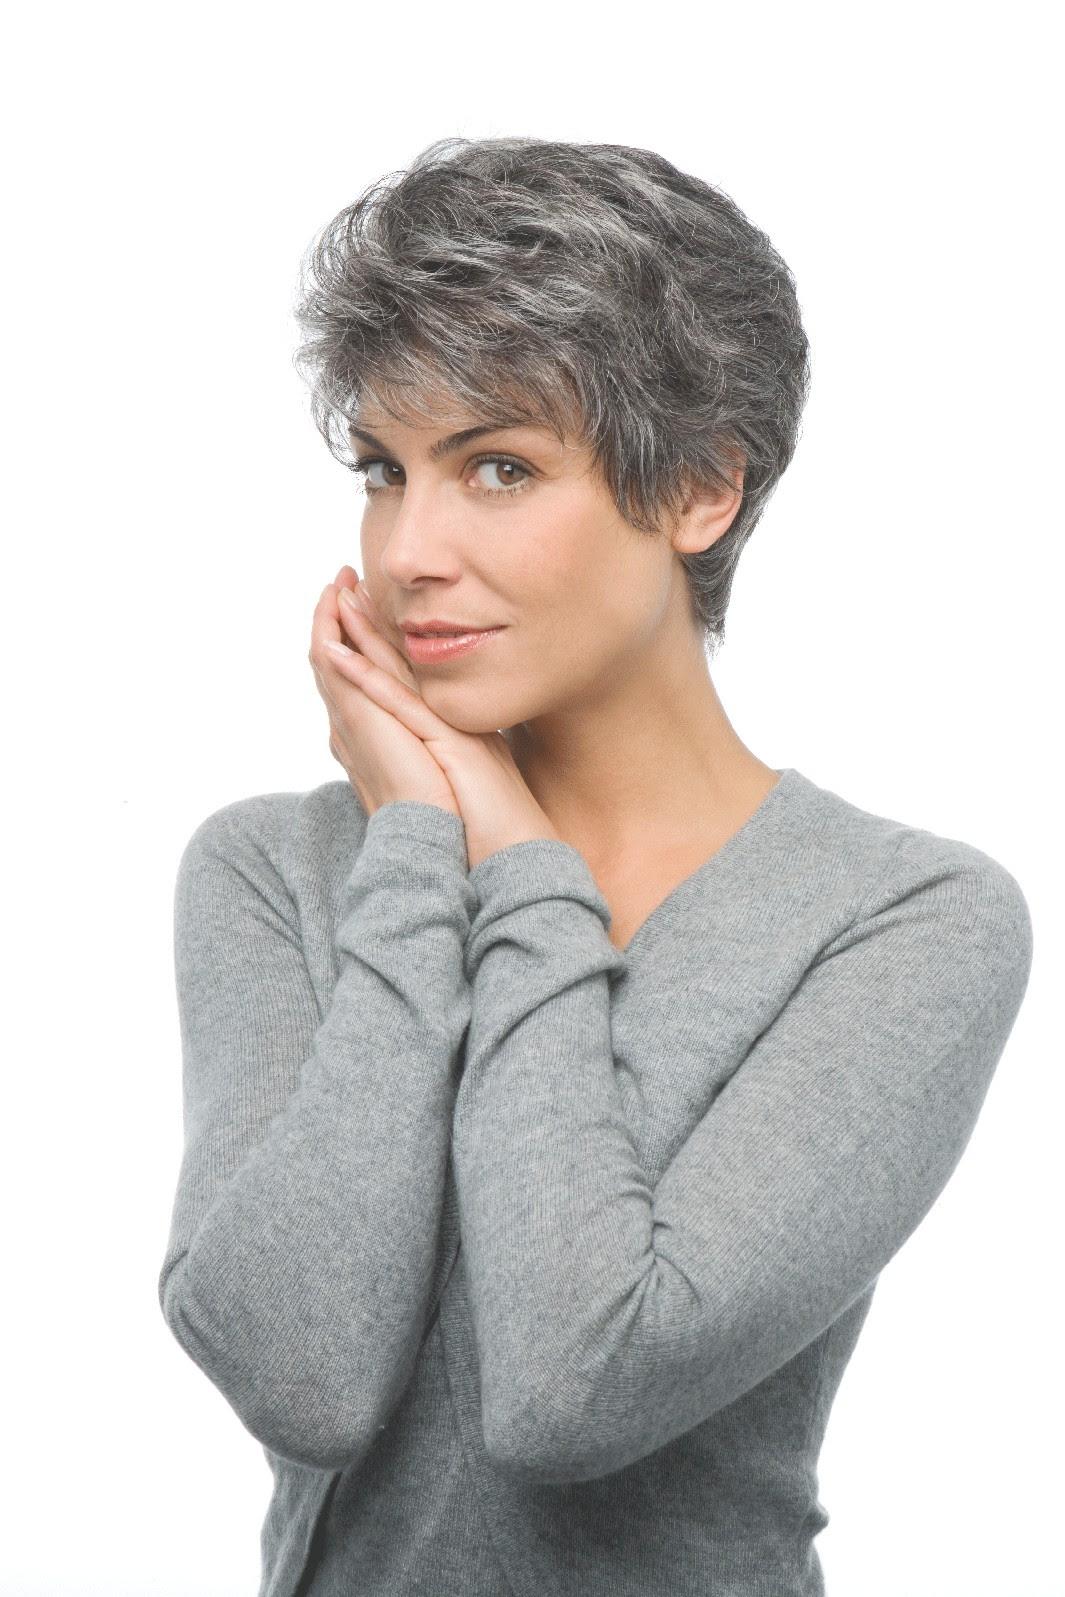 meowmeow: Modele Coupe Courte Femme Cheveux Gris